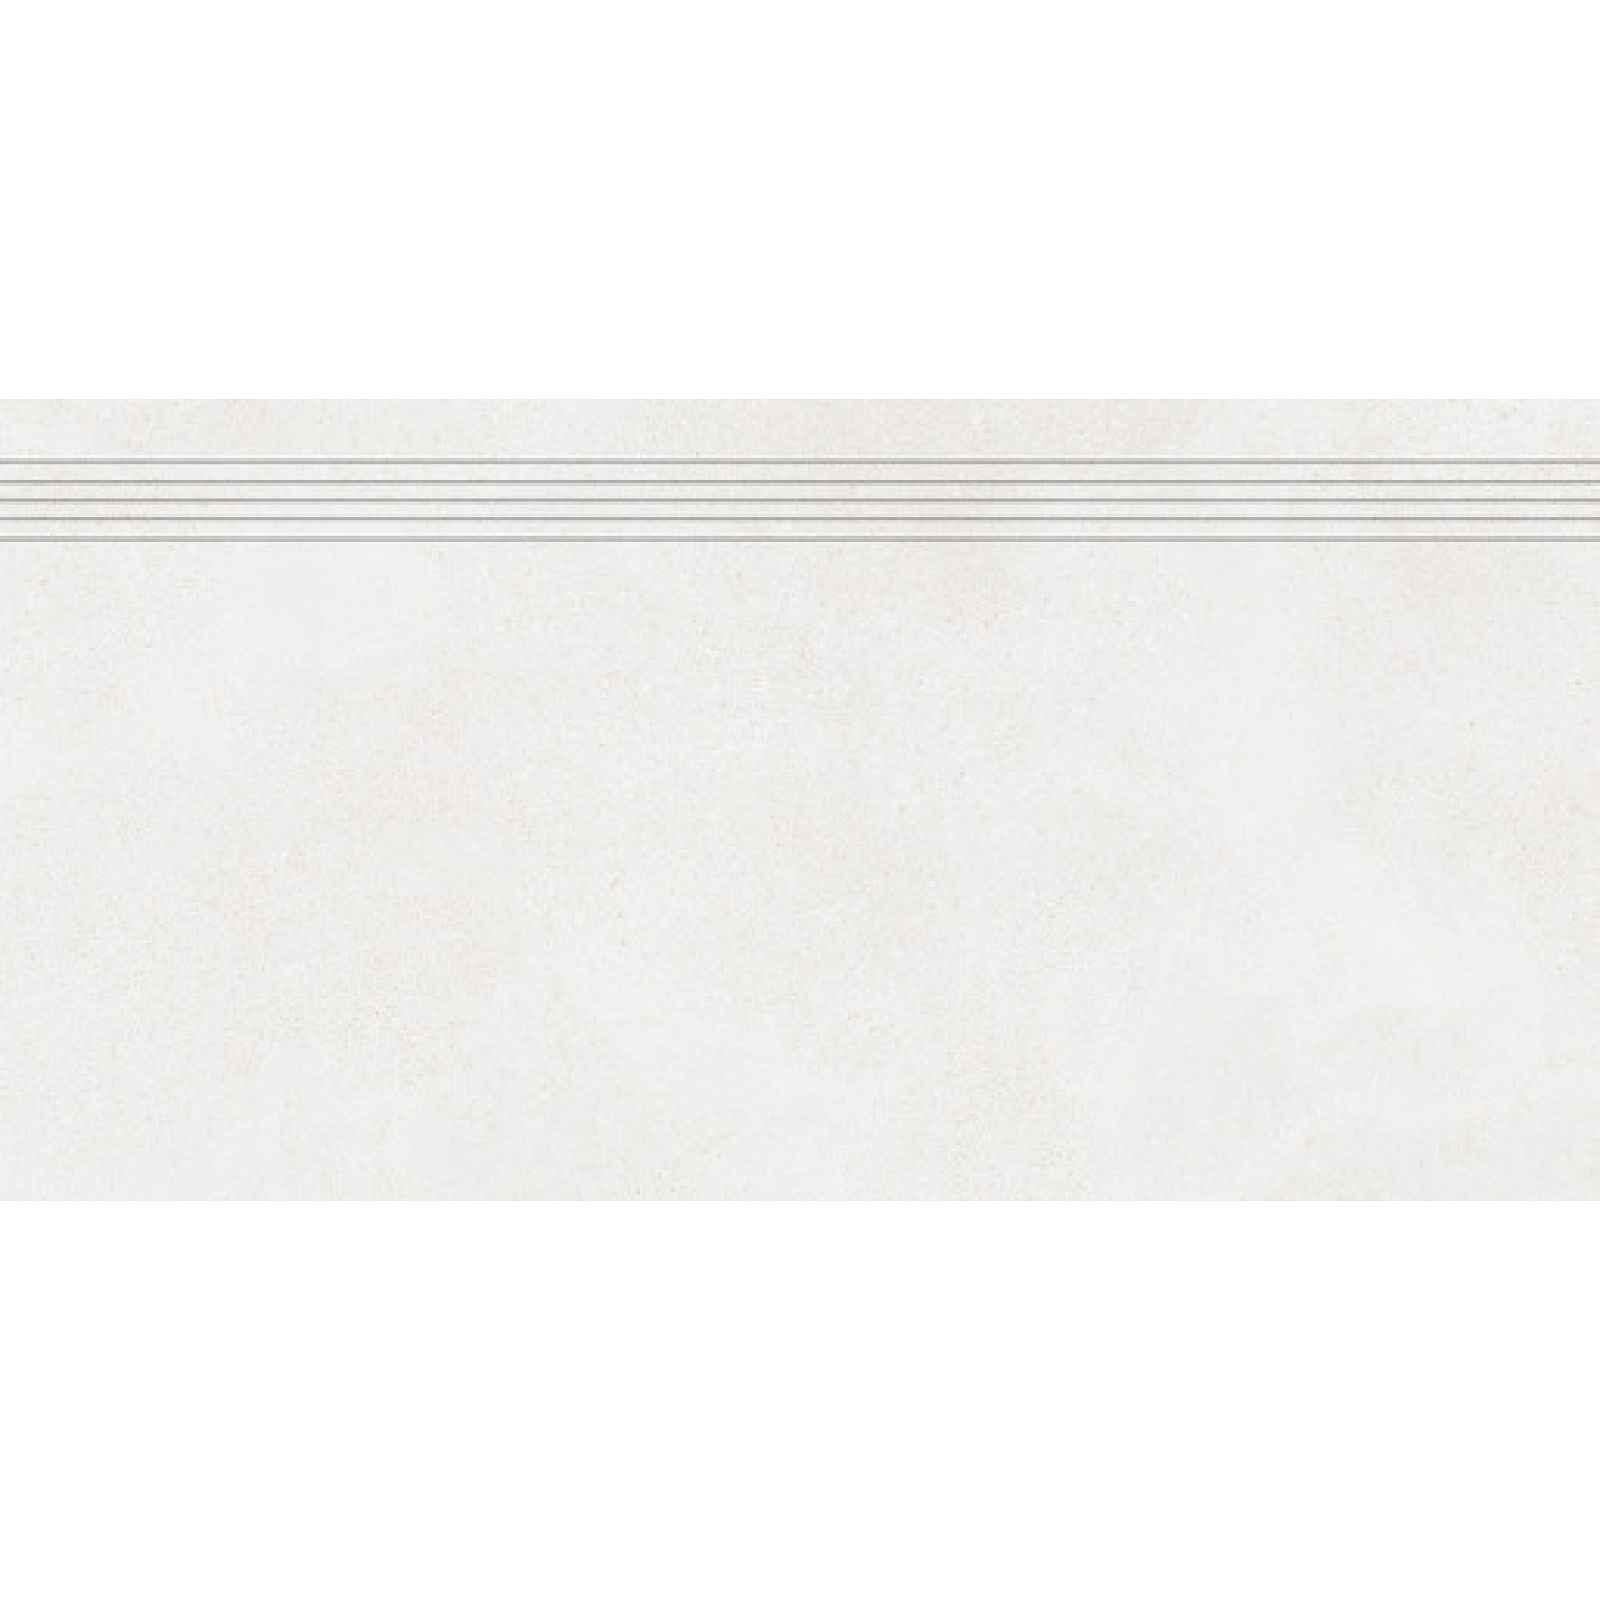 Schodovka RAKO Betonico bílošedá 40x80 cm mat DCP84790.1